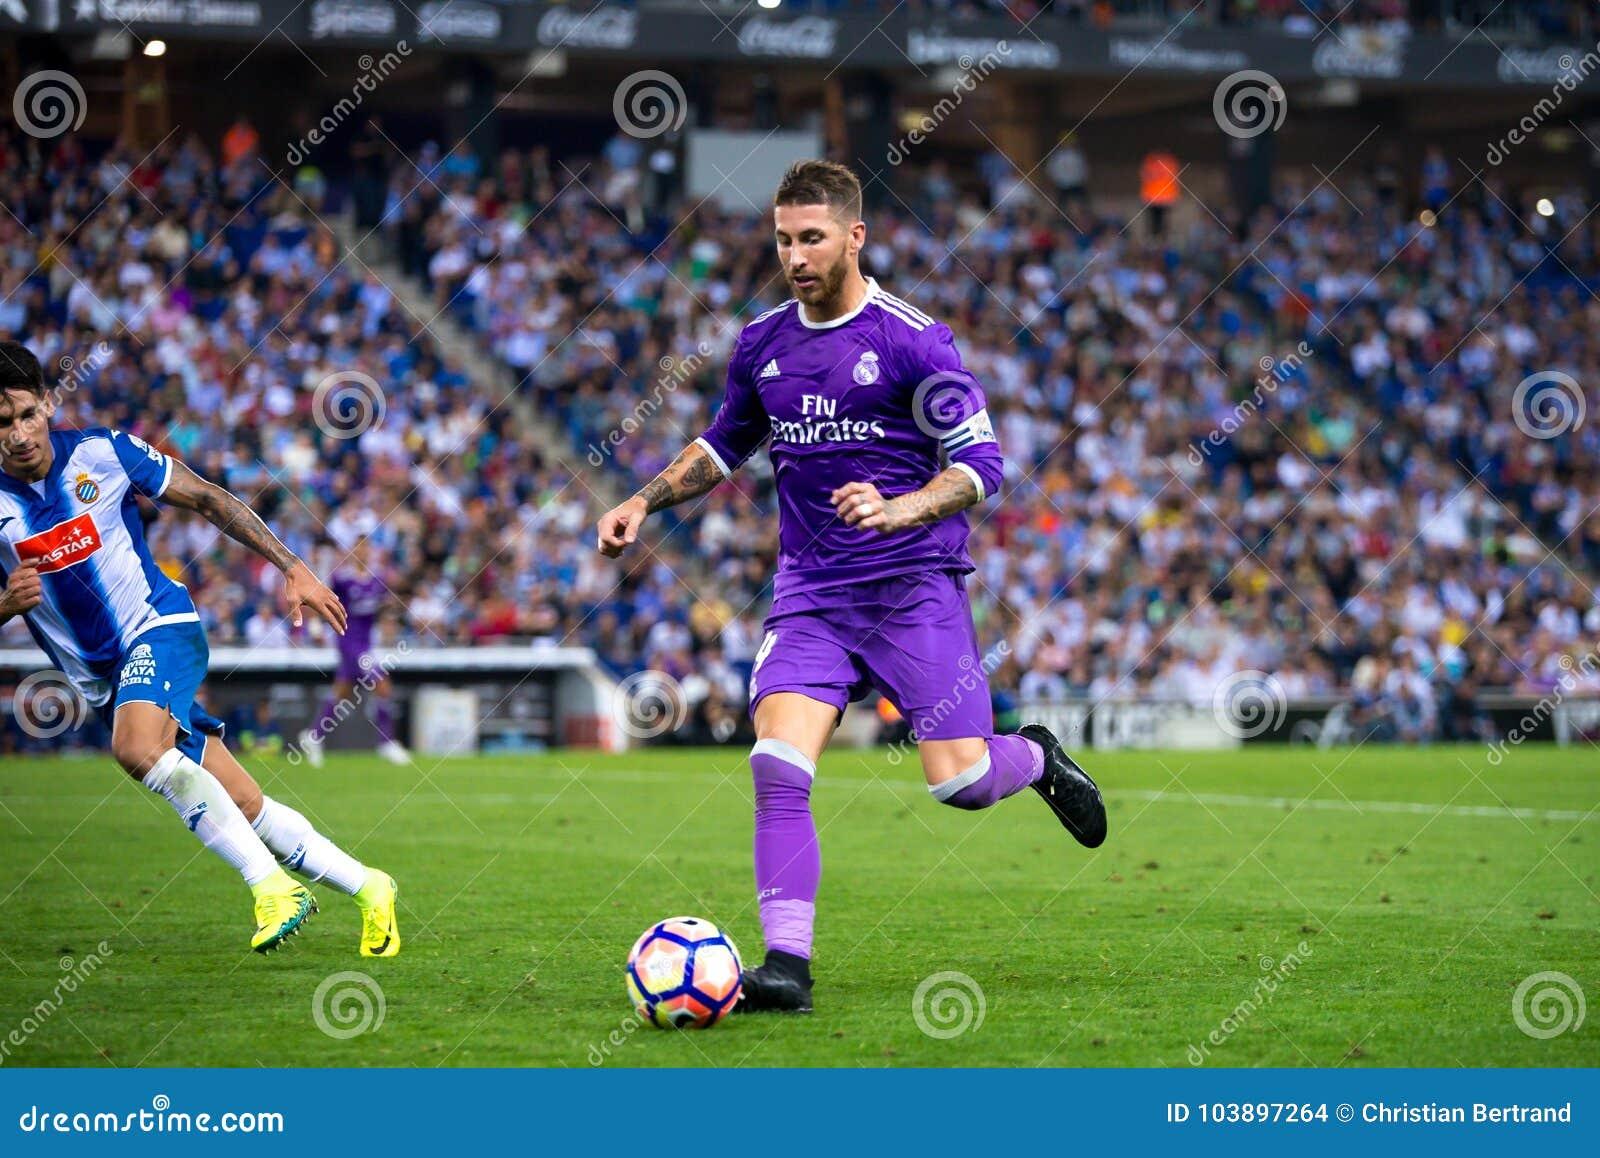 Sergio Ramos Soccer Real Madrid Stadium Soccer Pitches: Sergio Ramos Plays At The La Liga Match Between RCD